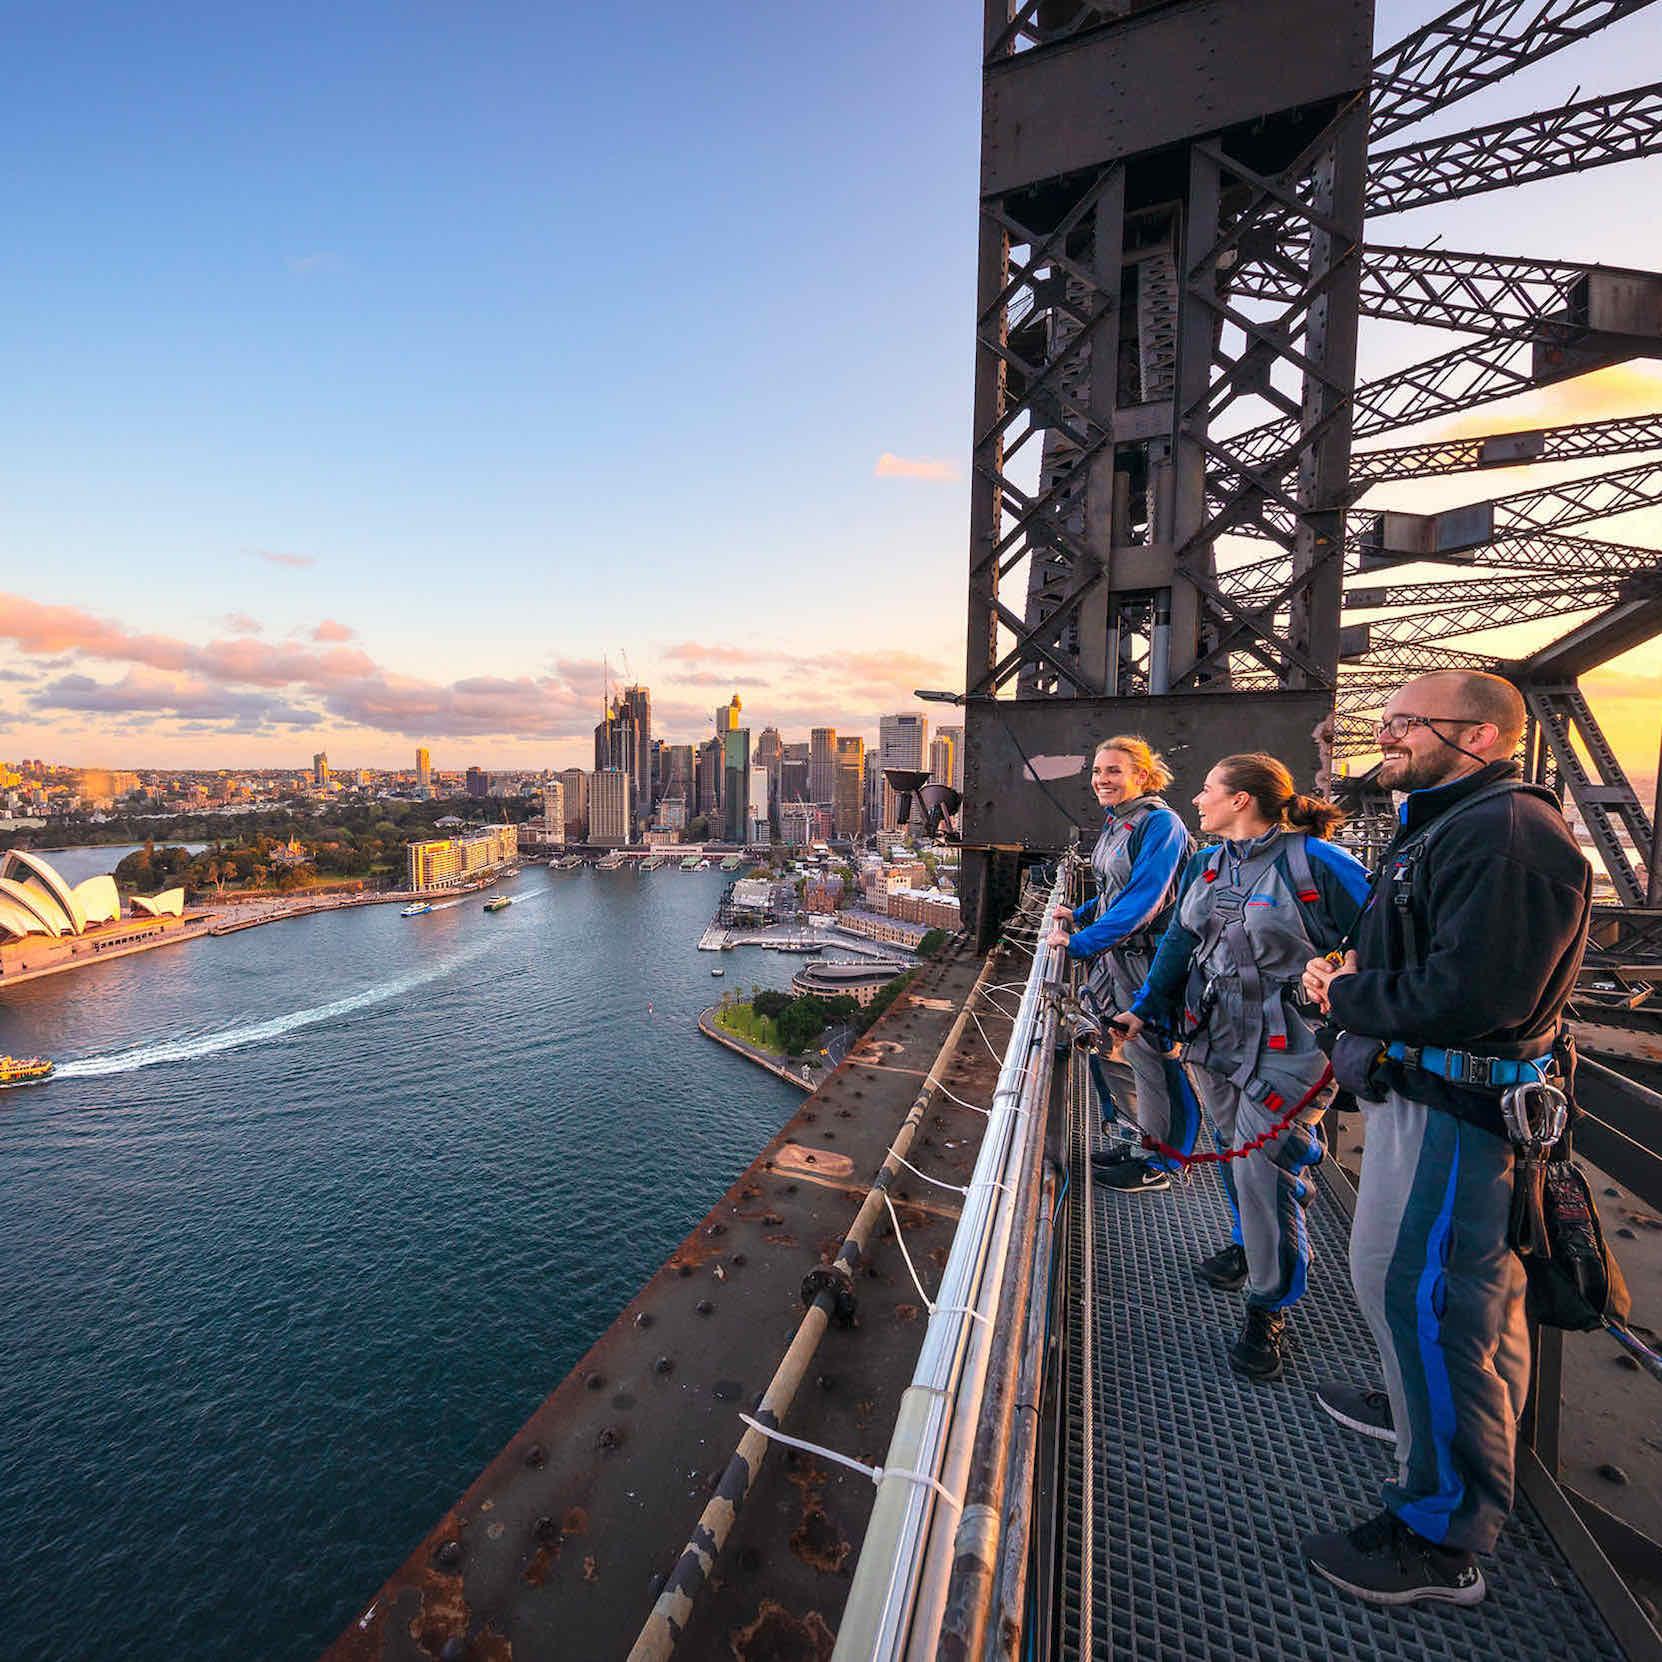 sq-sydney-harbour-bridge-climb-destinationNSW-photo-credit